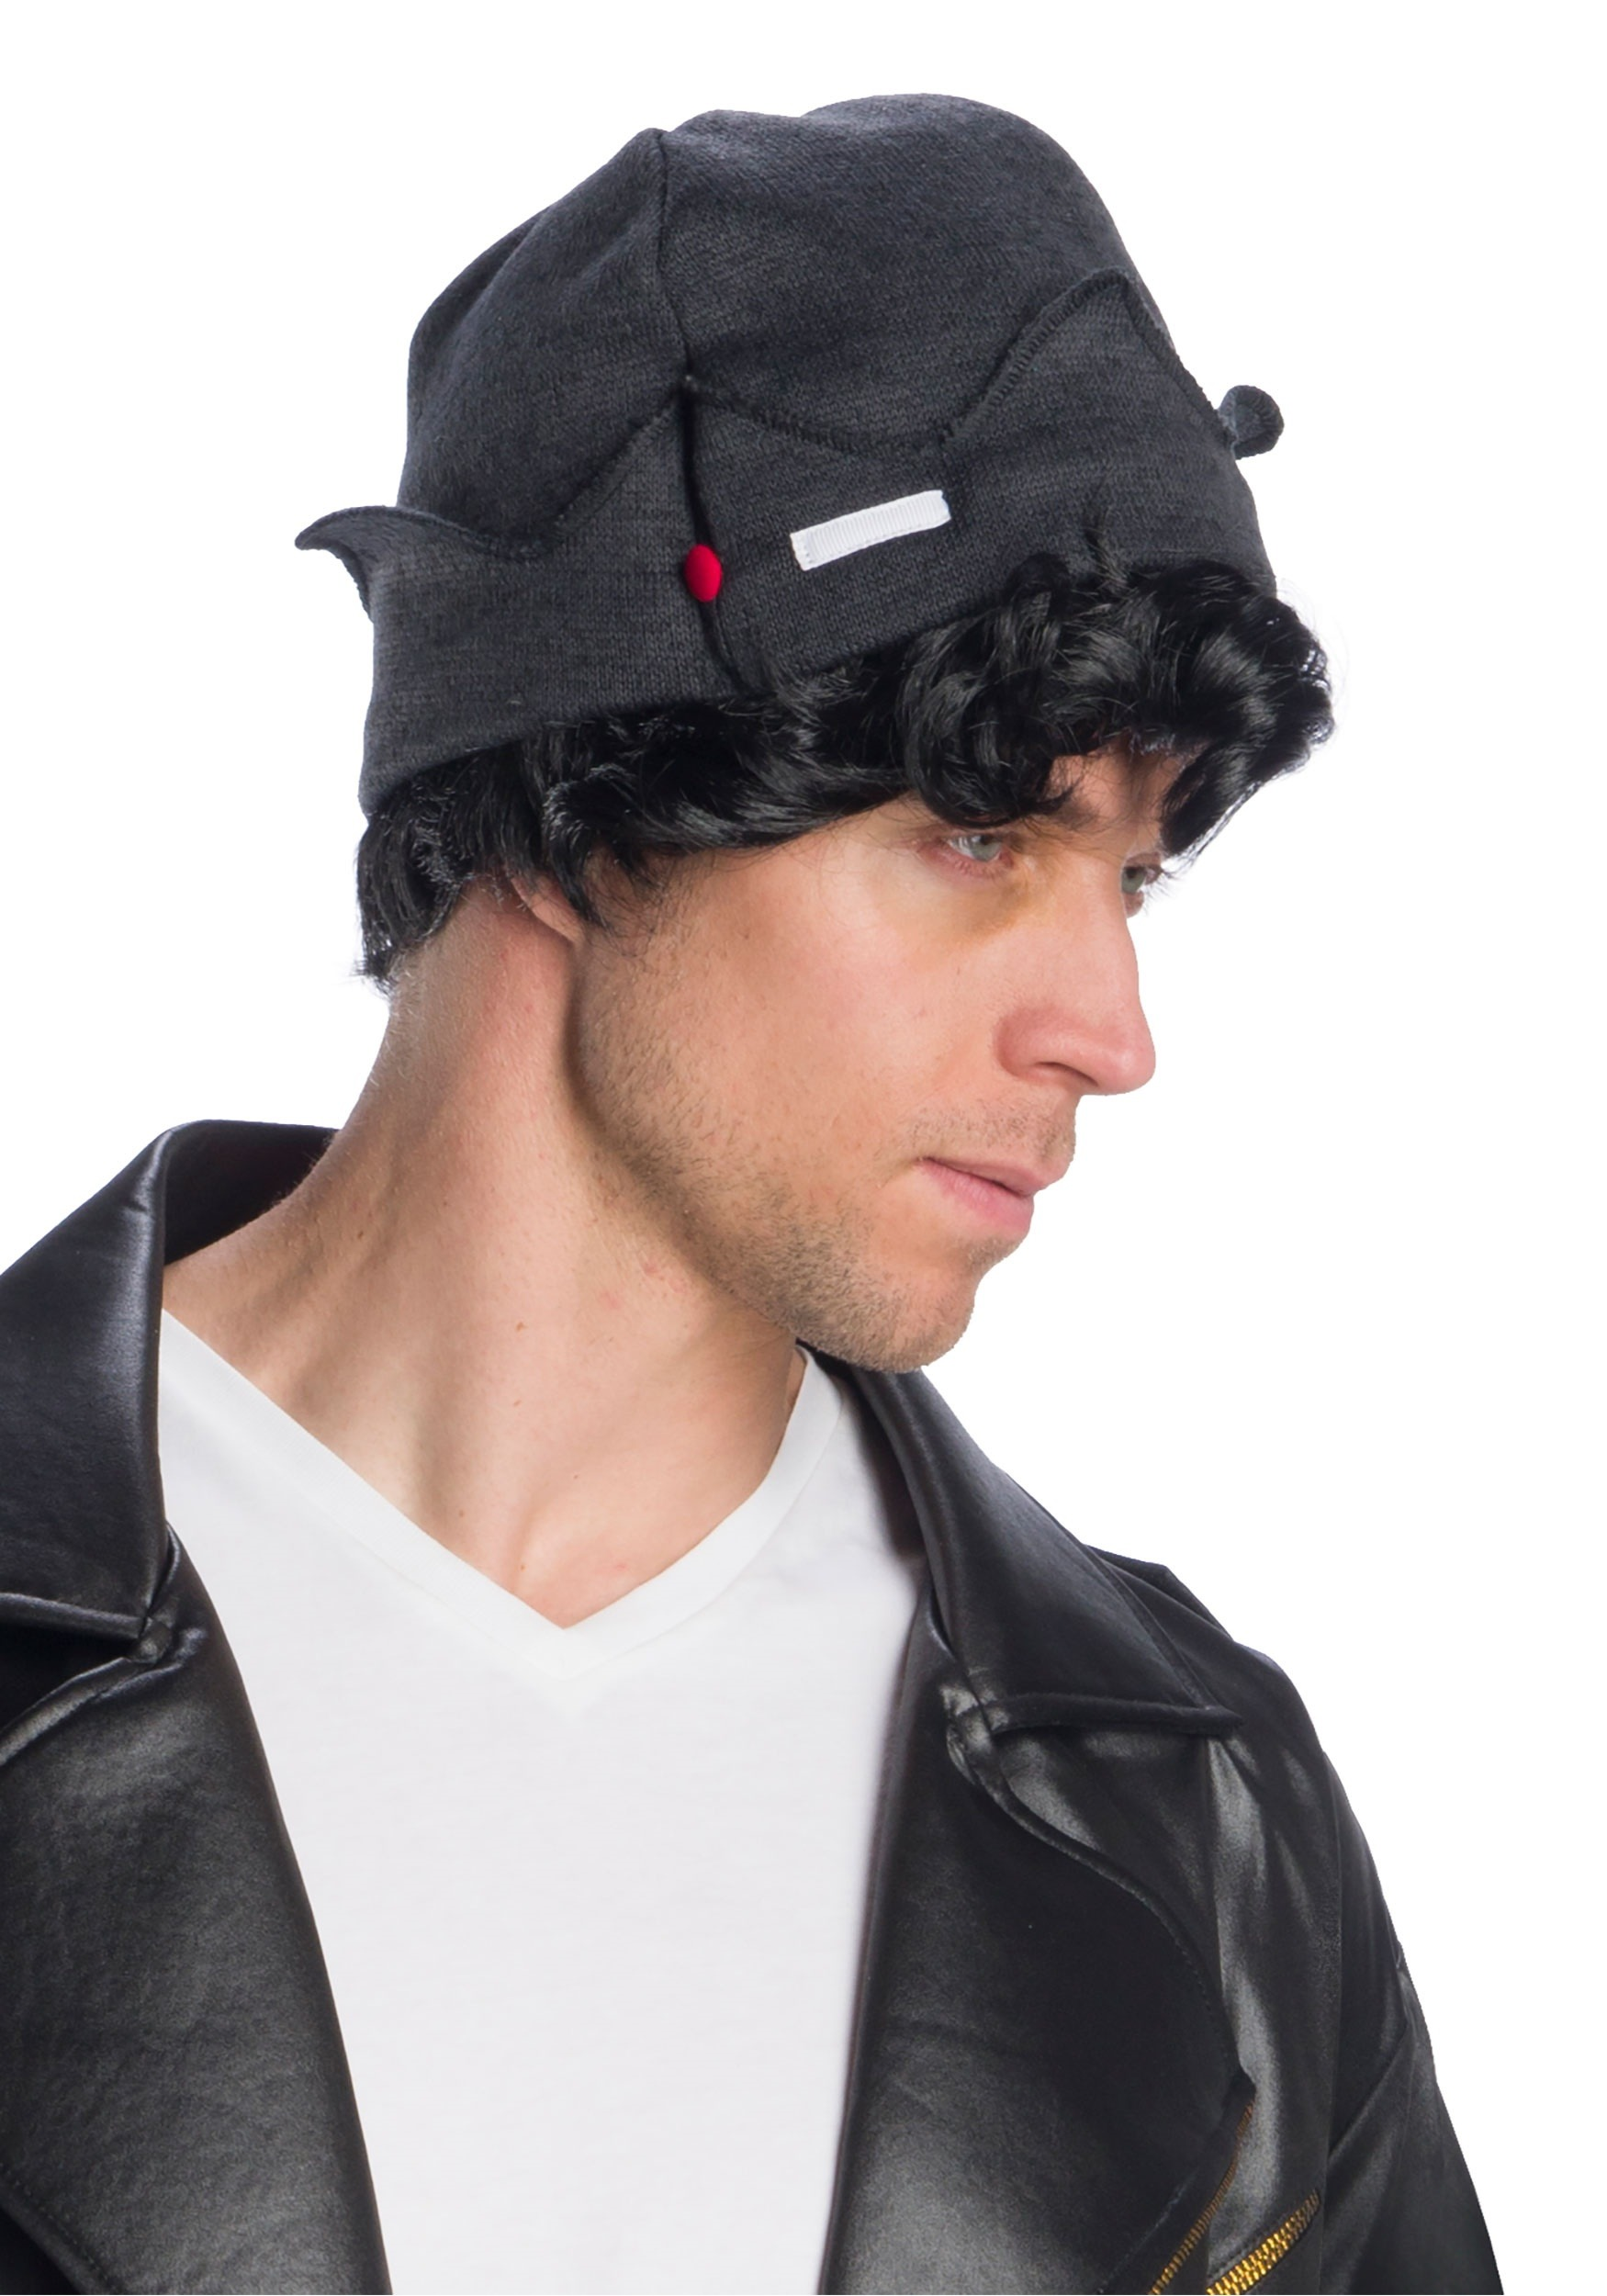 jughead jones riverdale knitted cap